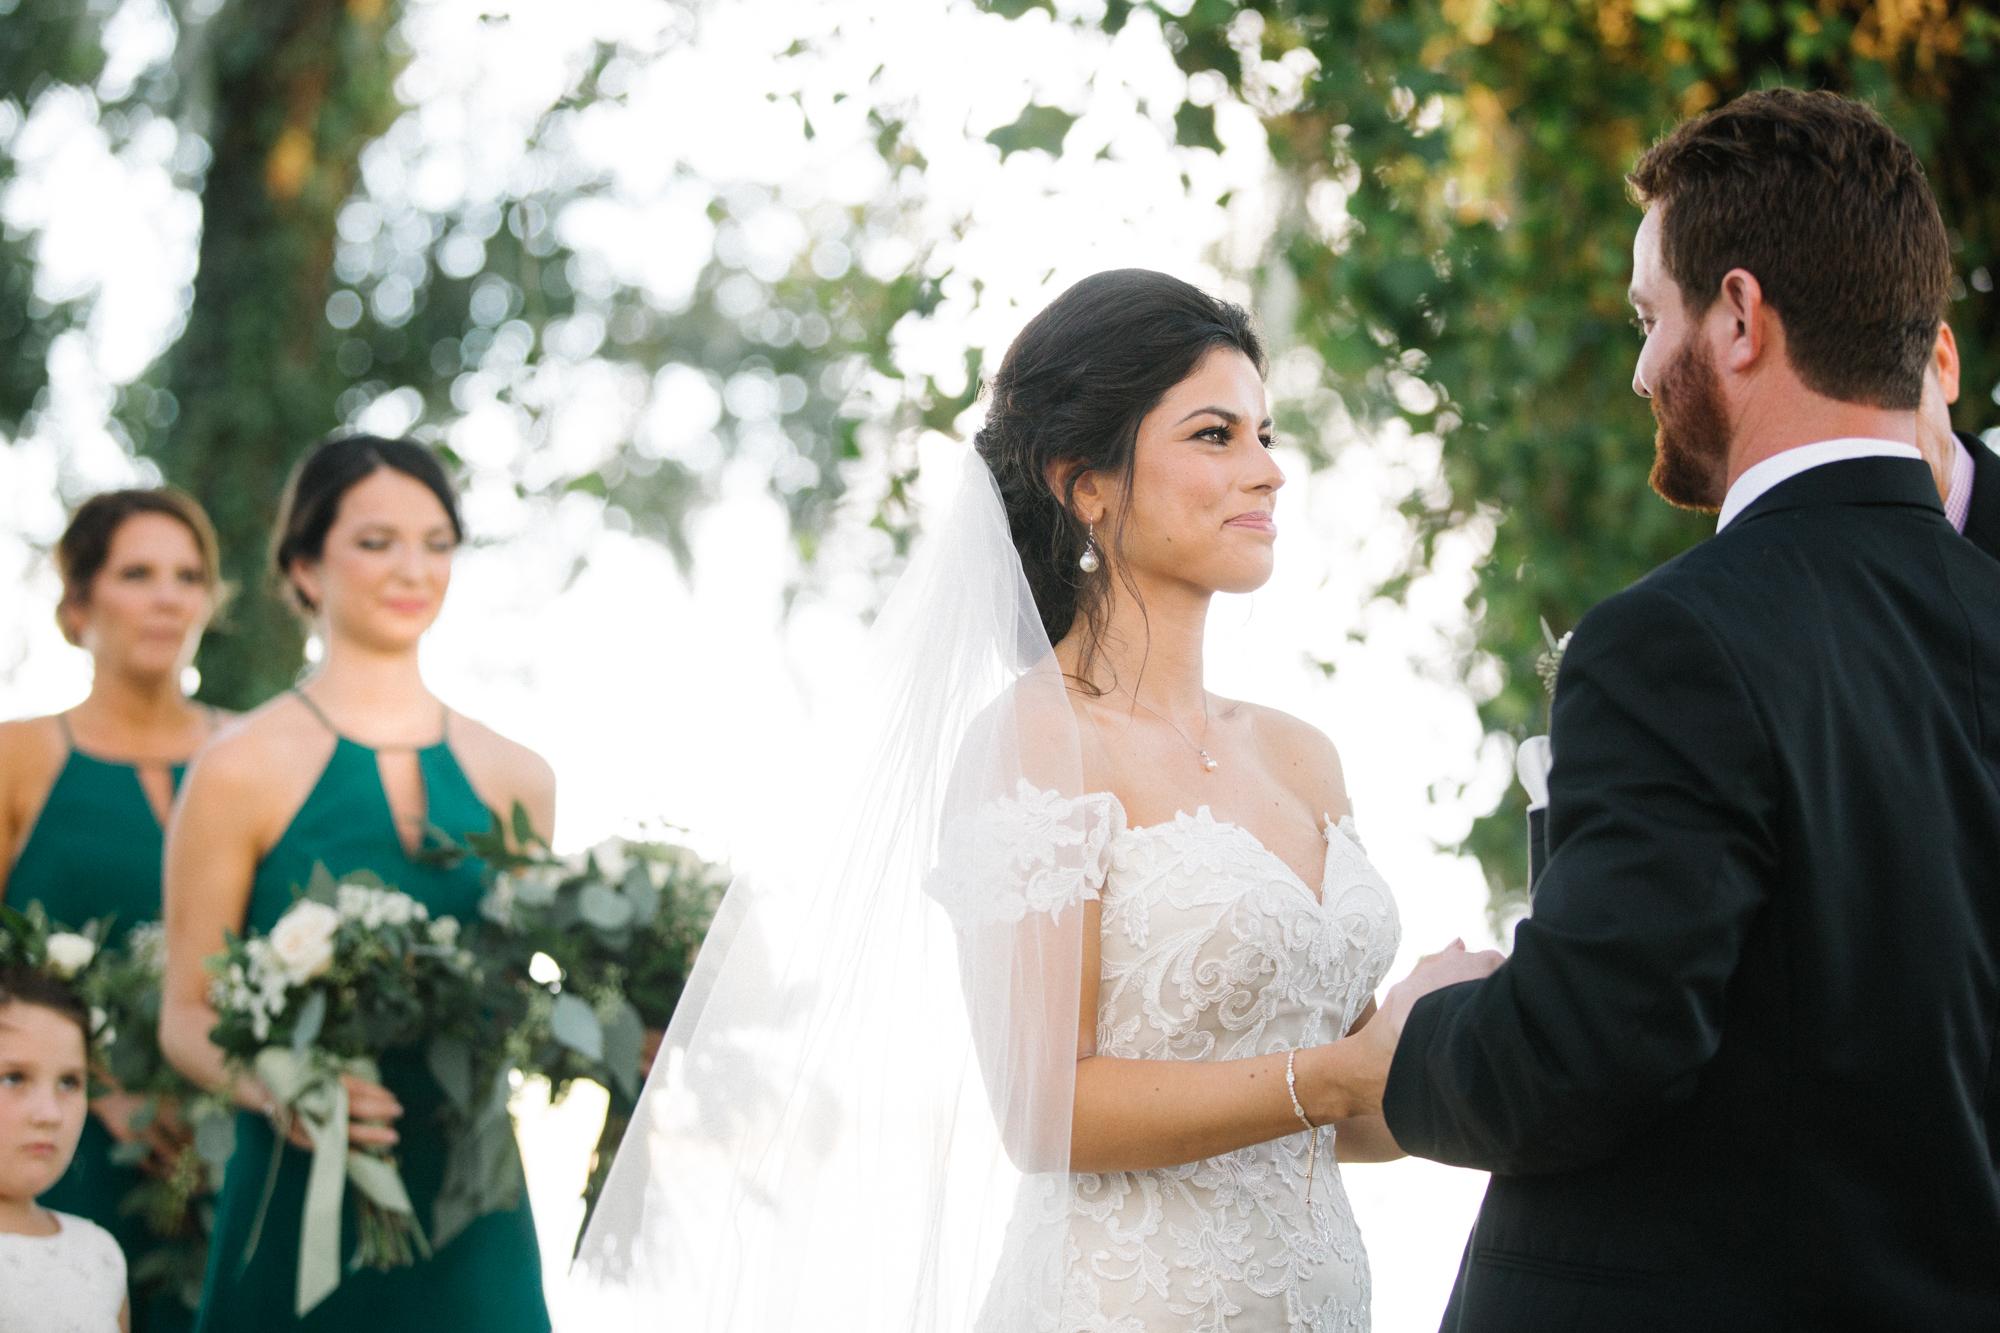 Gautier_Wedding_Photographer-122.jpg